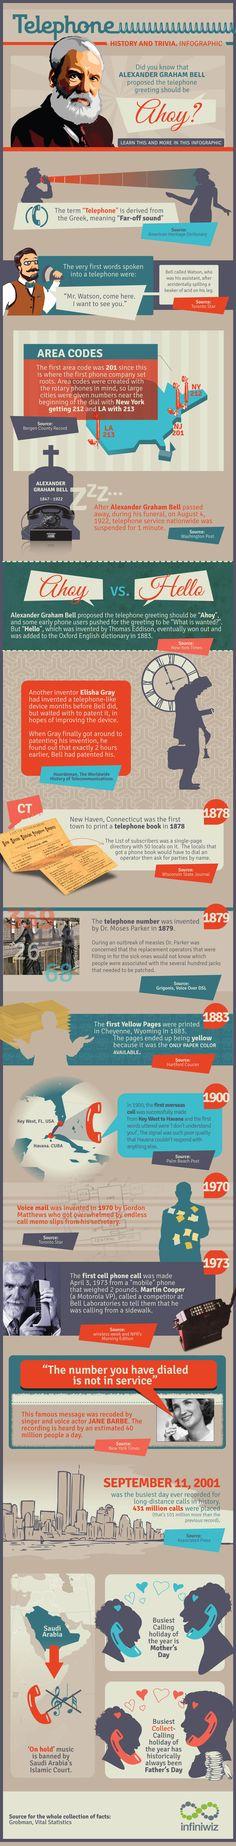 Telephone – History & Trivia – Infographic | Infiniwiz